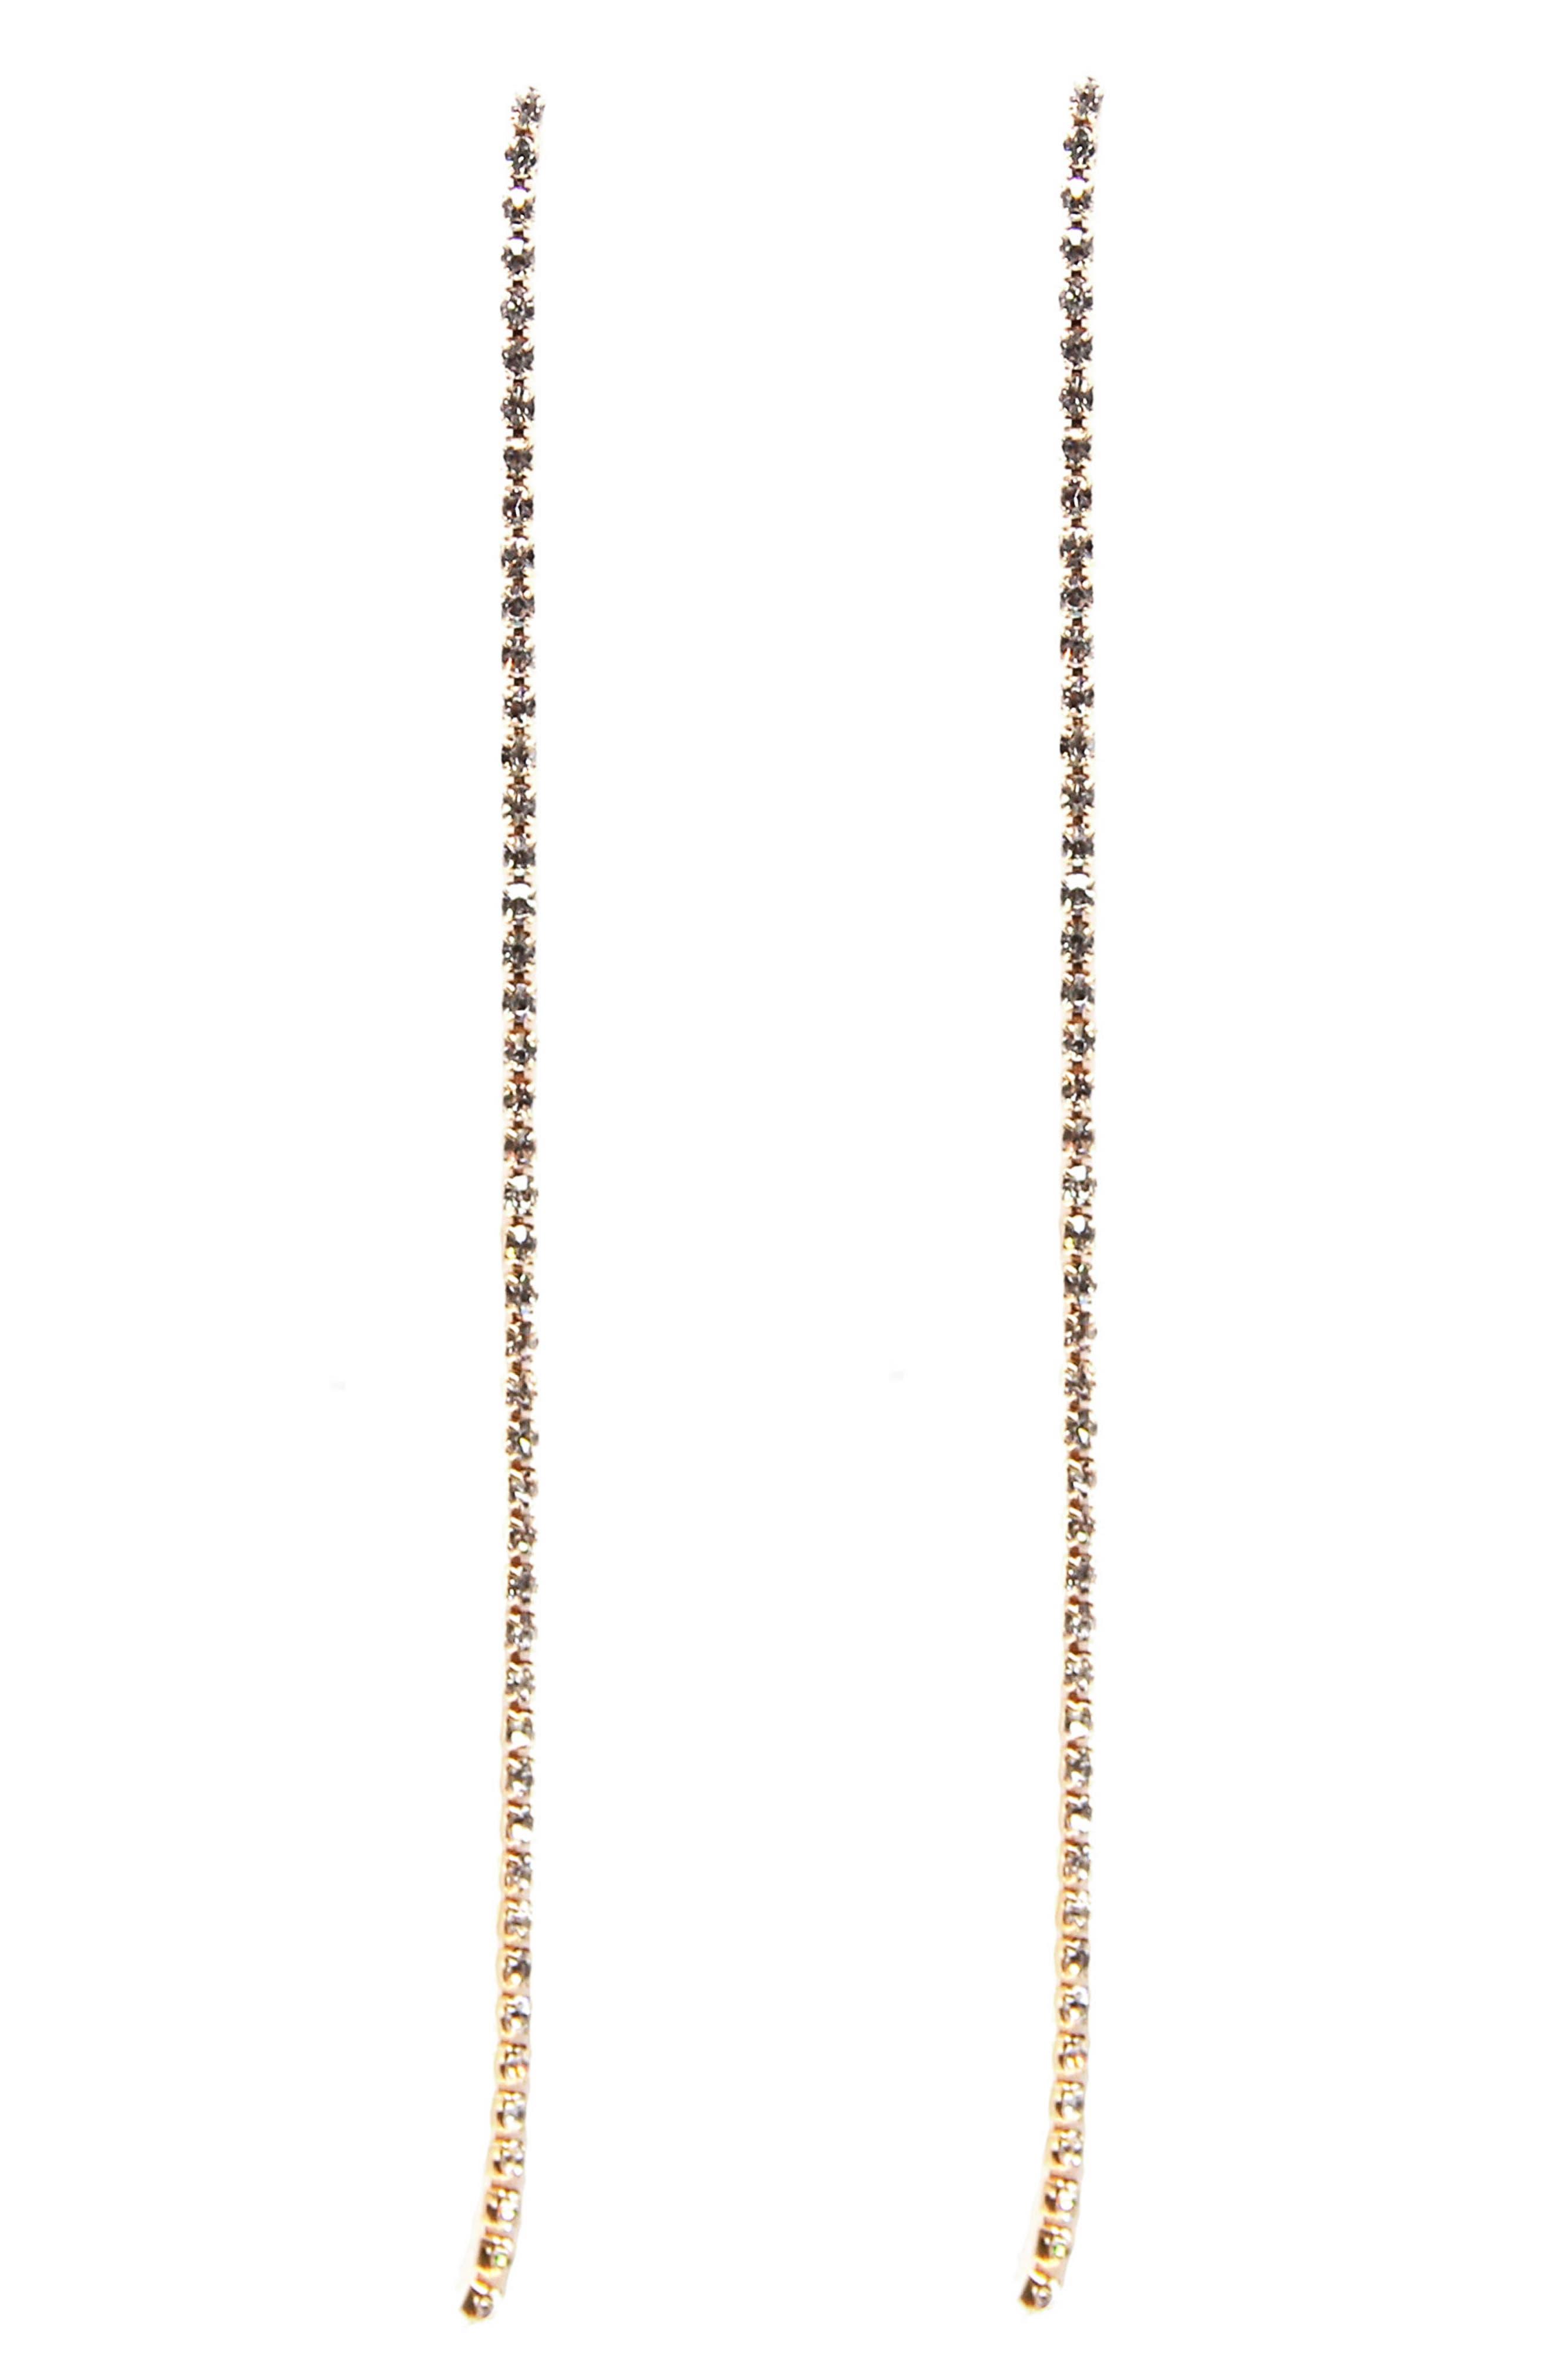 Main Image - Ettika Crystal Chain Earrings